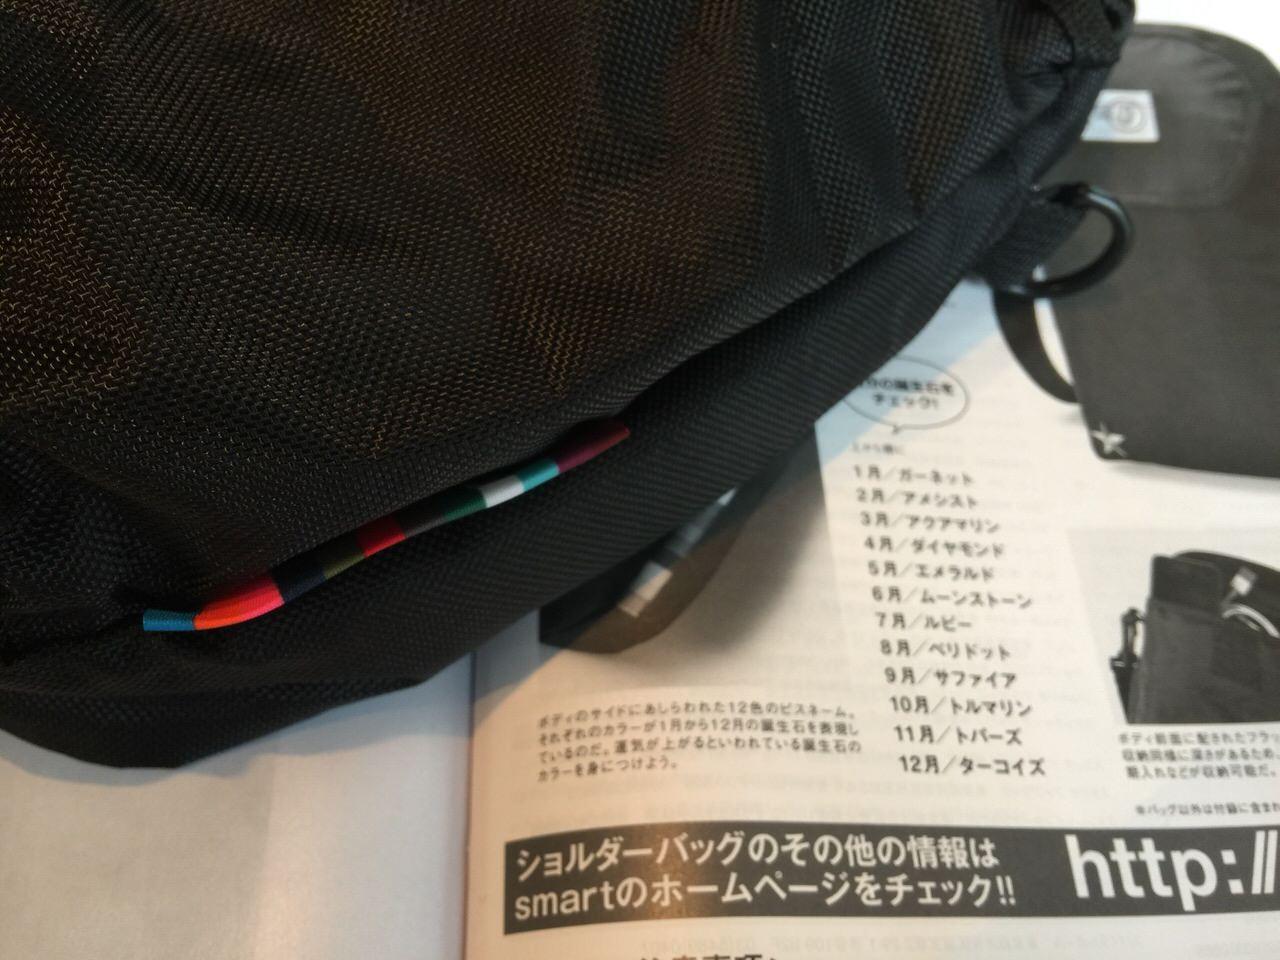 Smart bag 3468